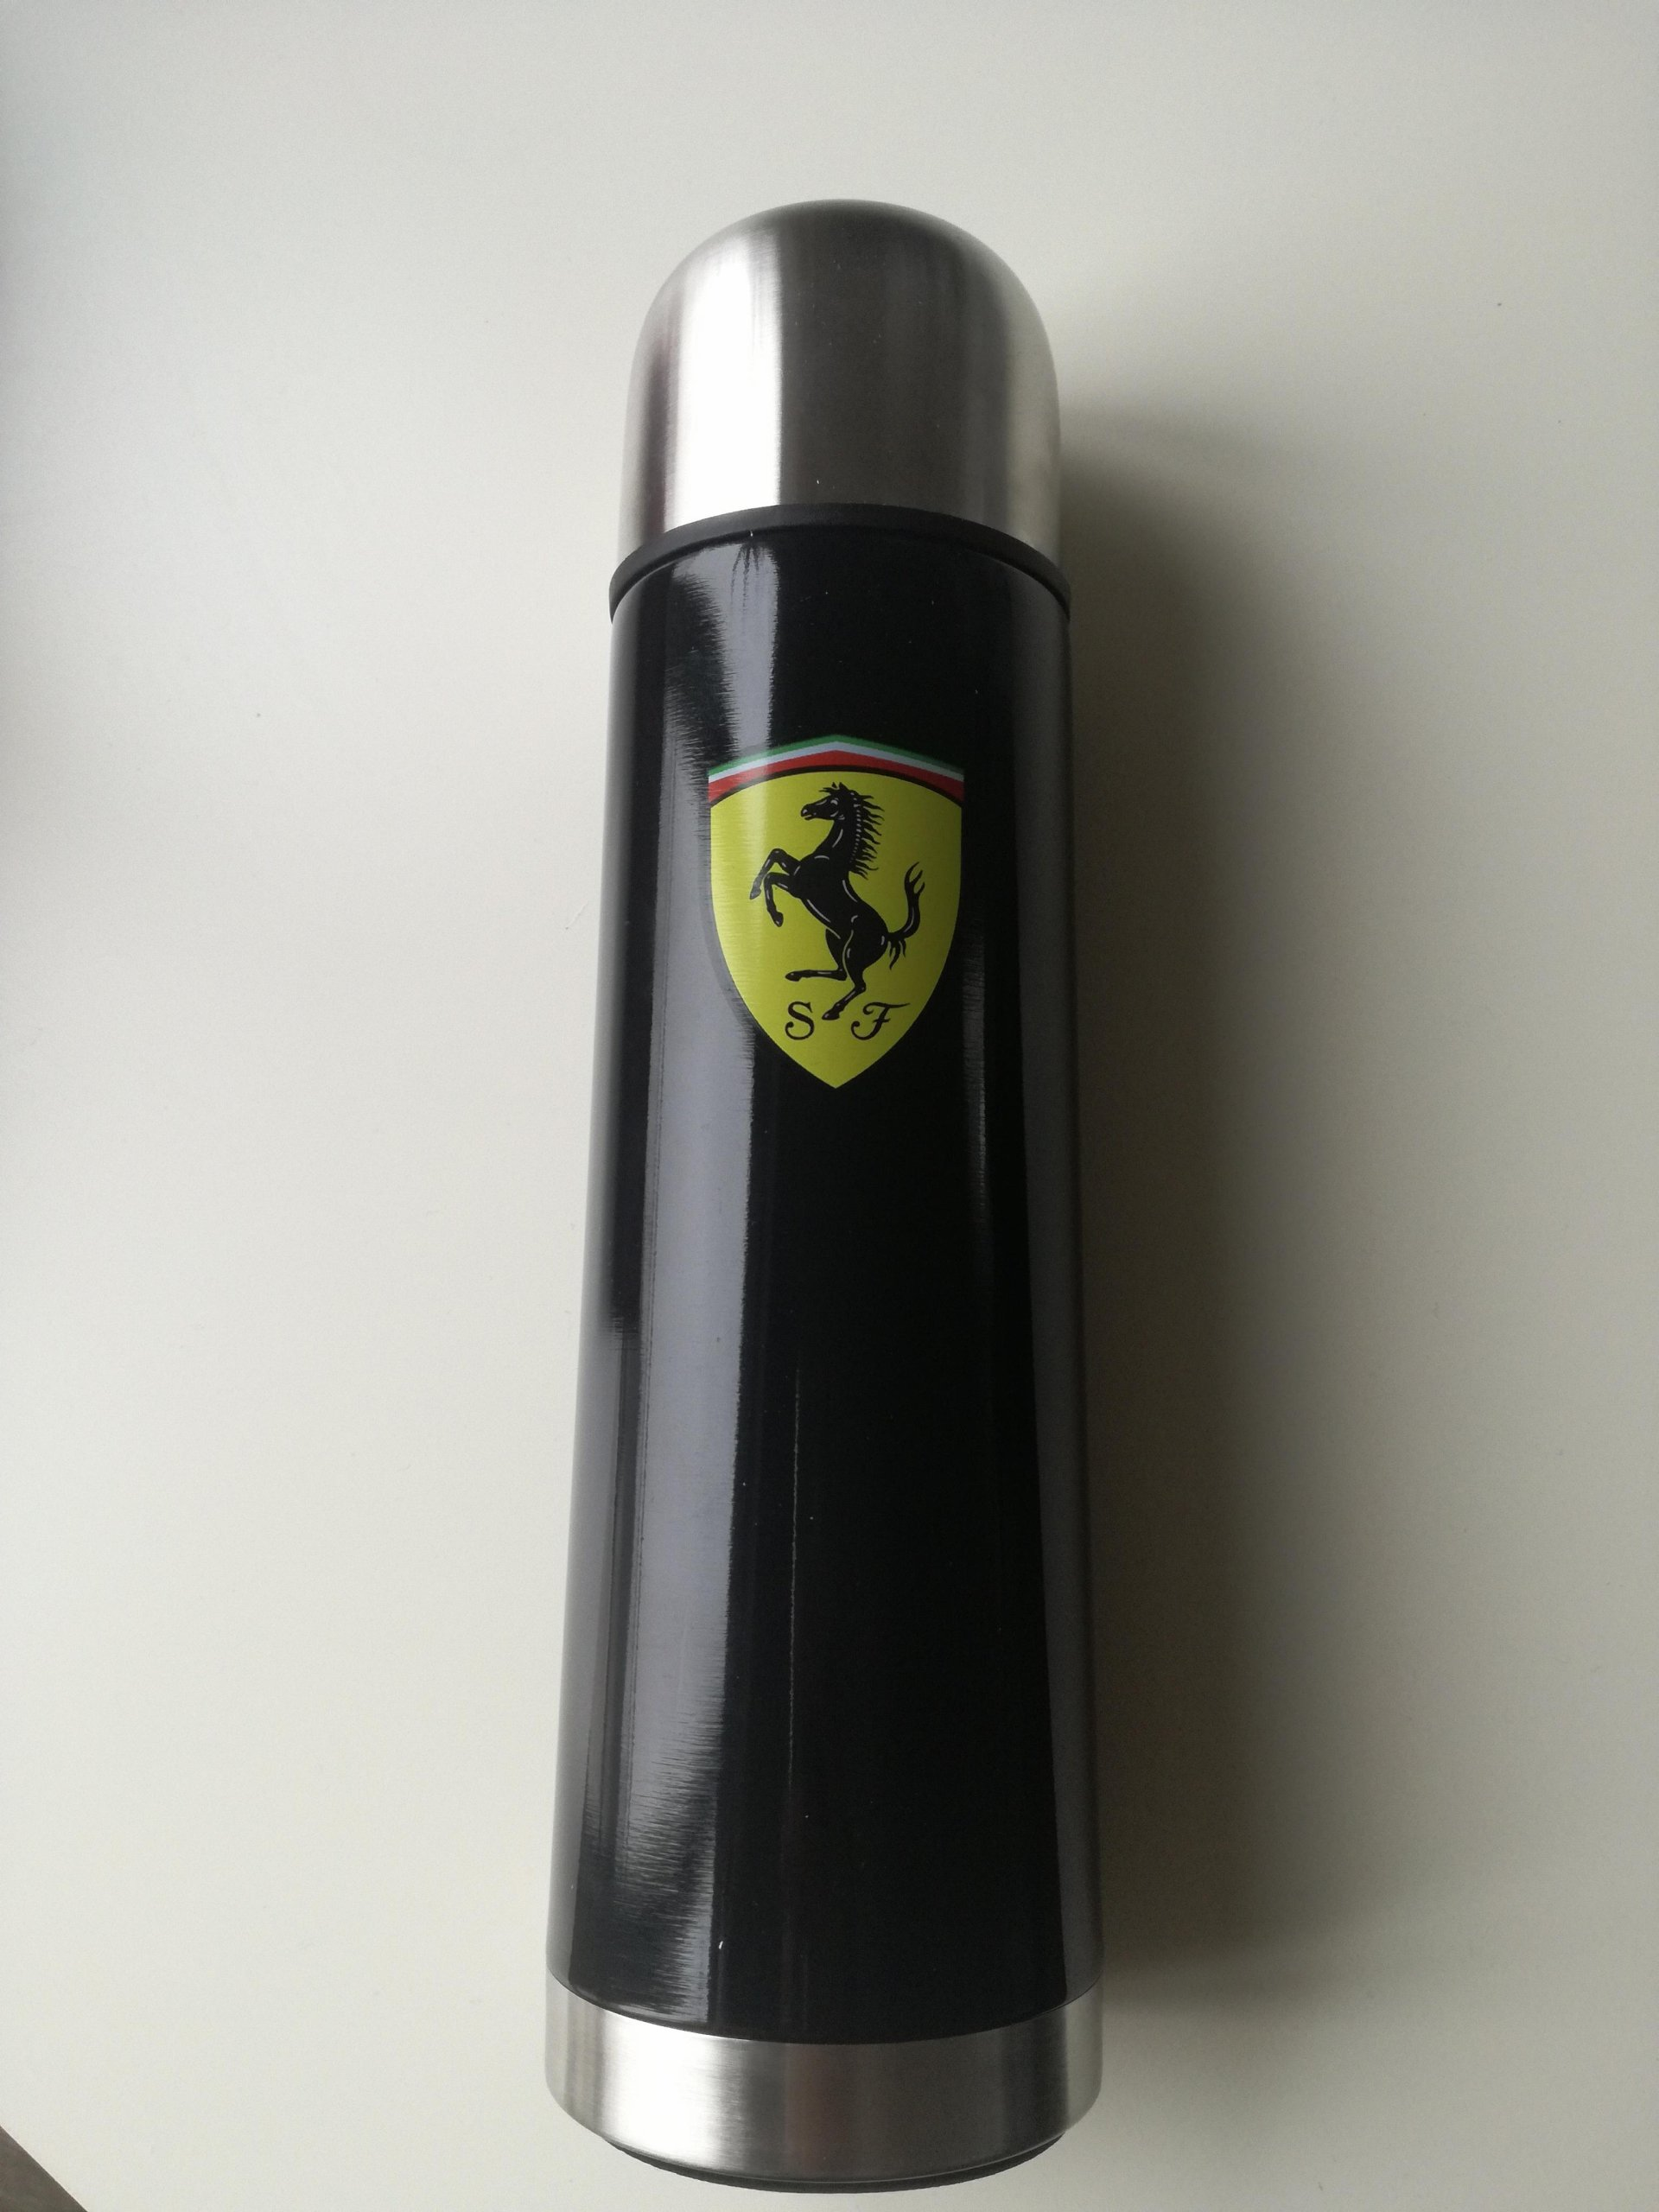 Oryginalny termos Scuderia Ferrari czarny